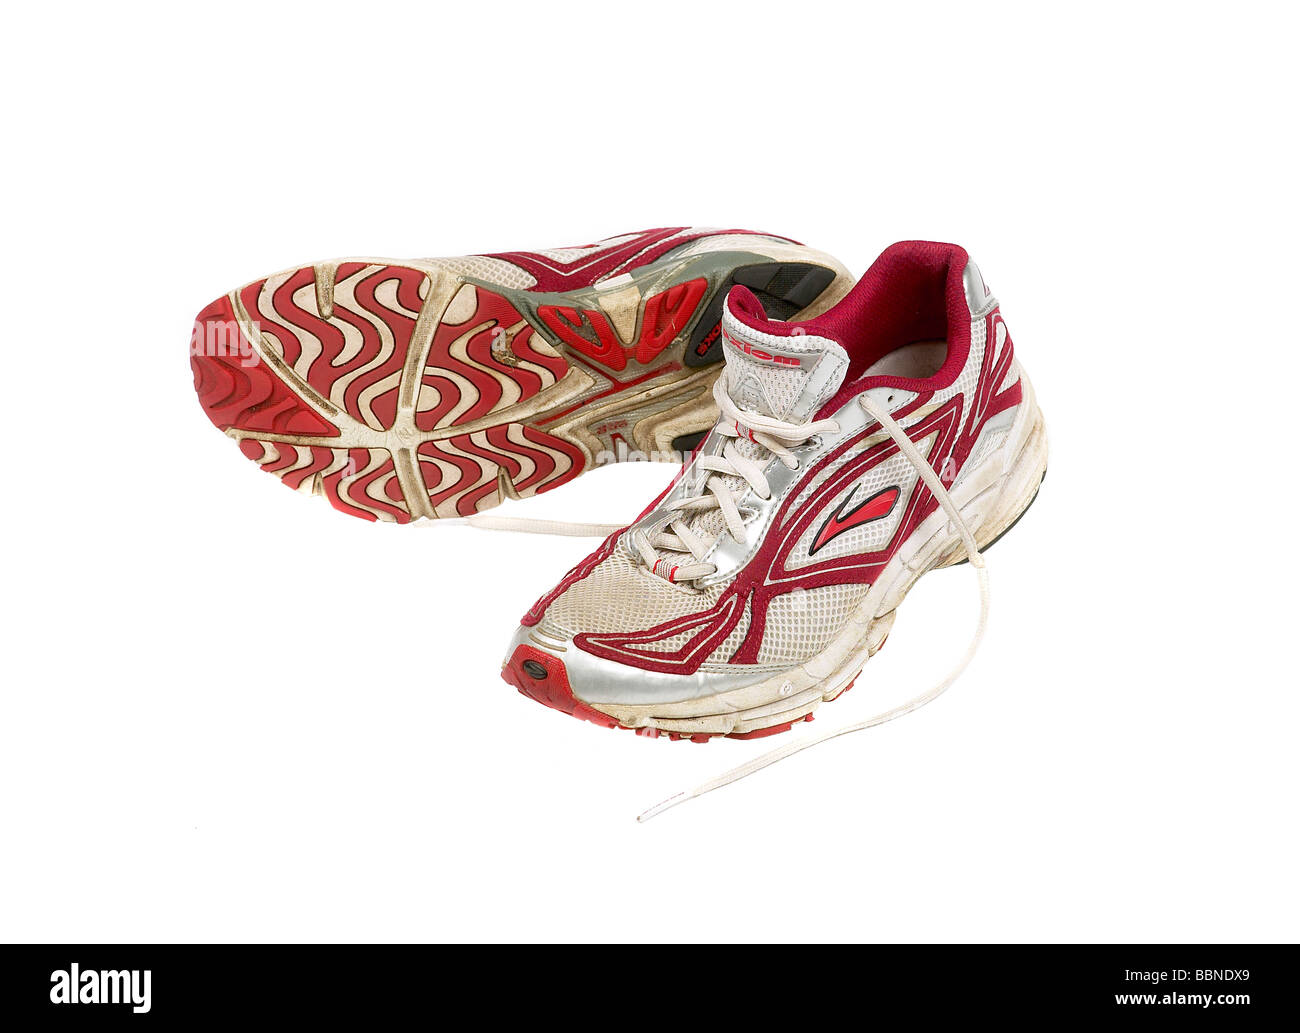 scarpe Esecuzione ginnastica di Immagini Stock vecchie da pzExUT